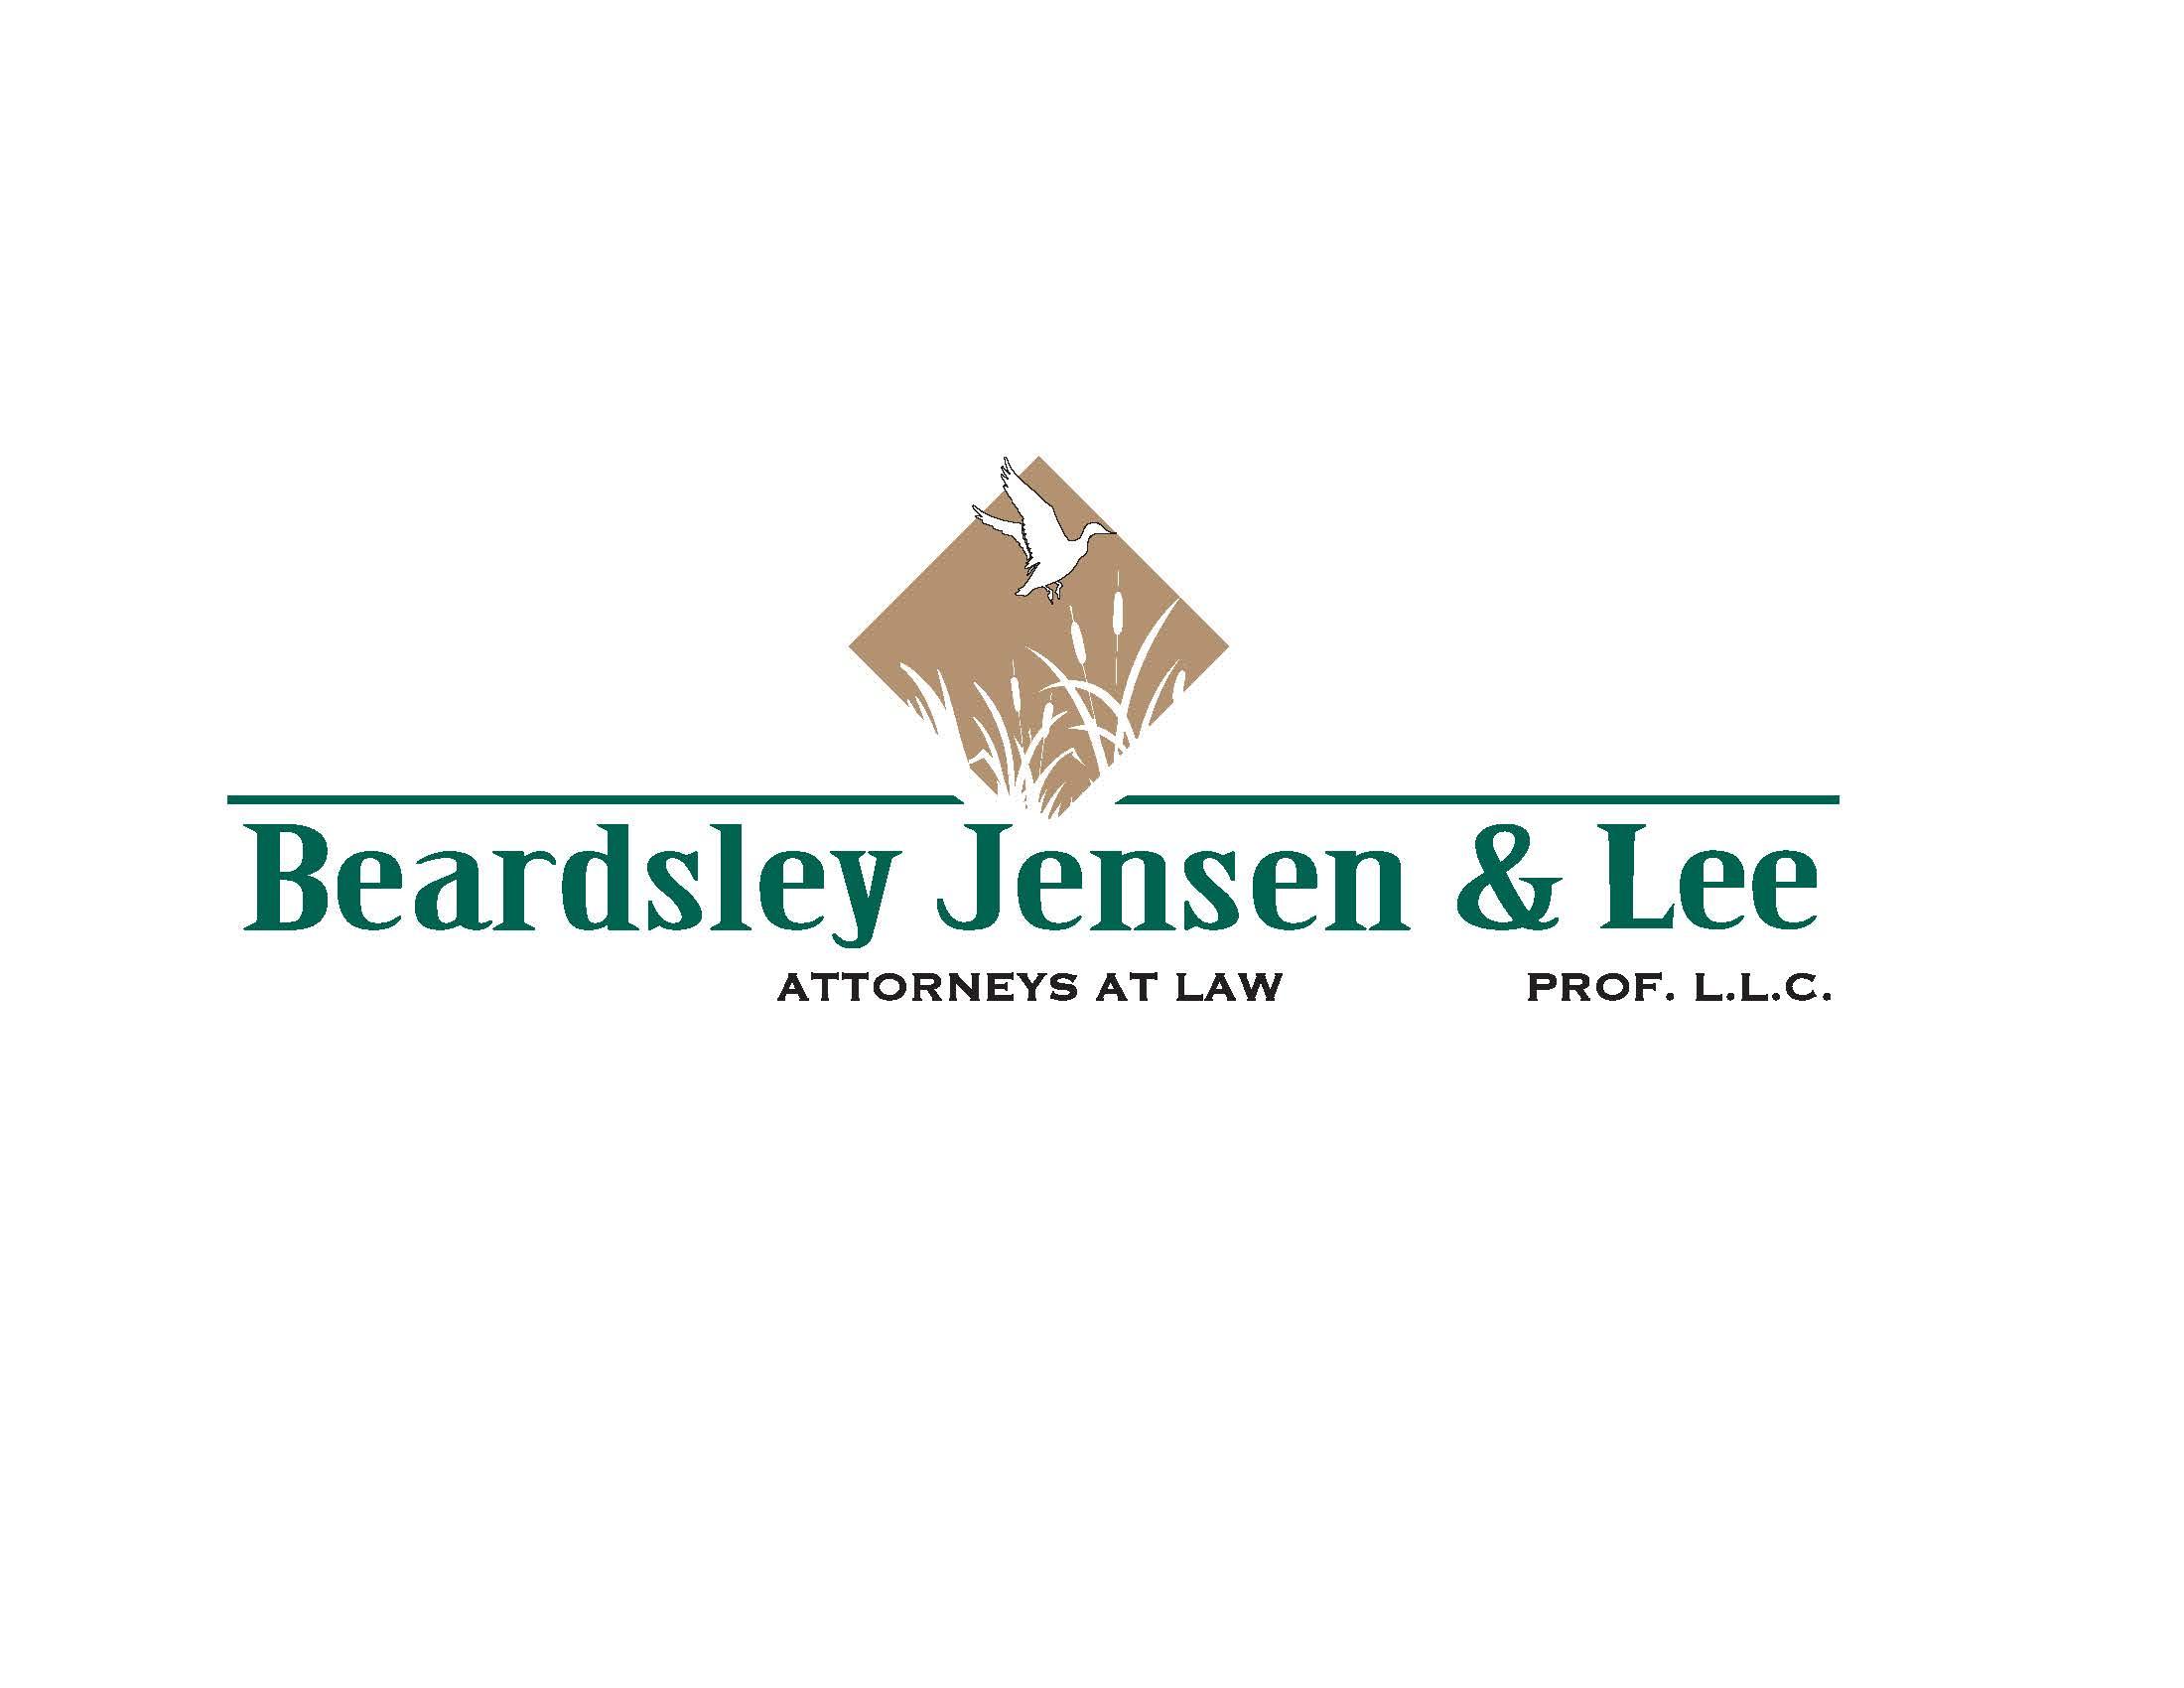 Beardsley Jensen & Lee, PLLC